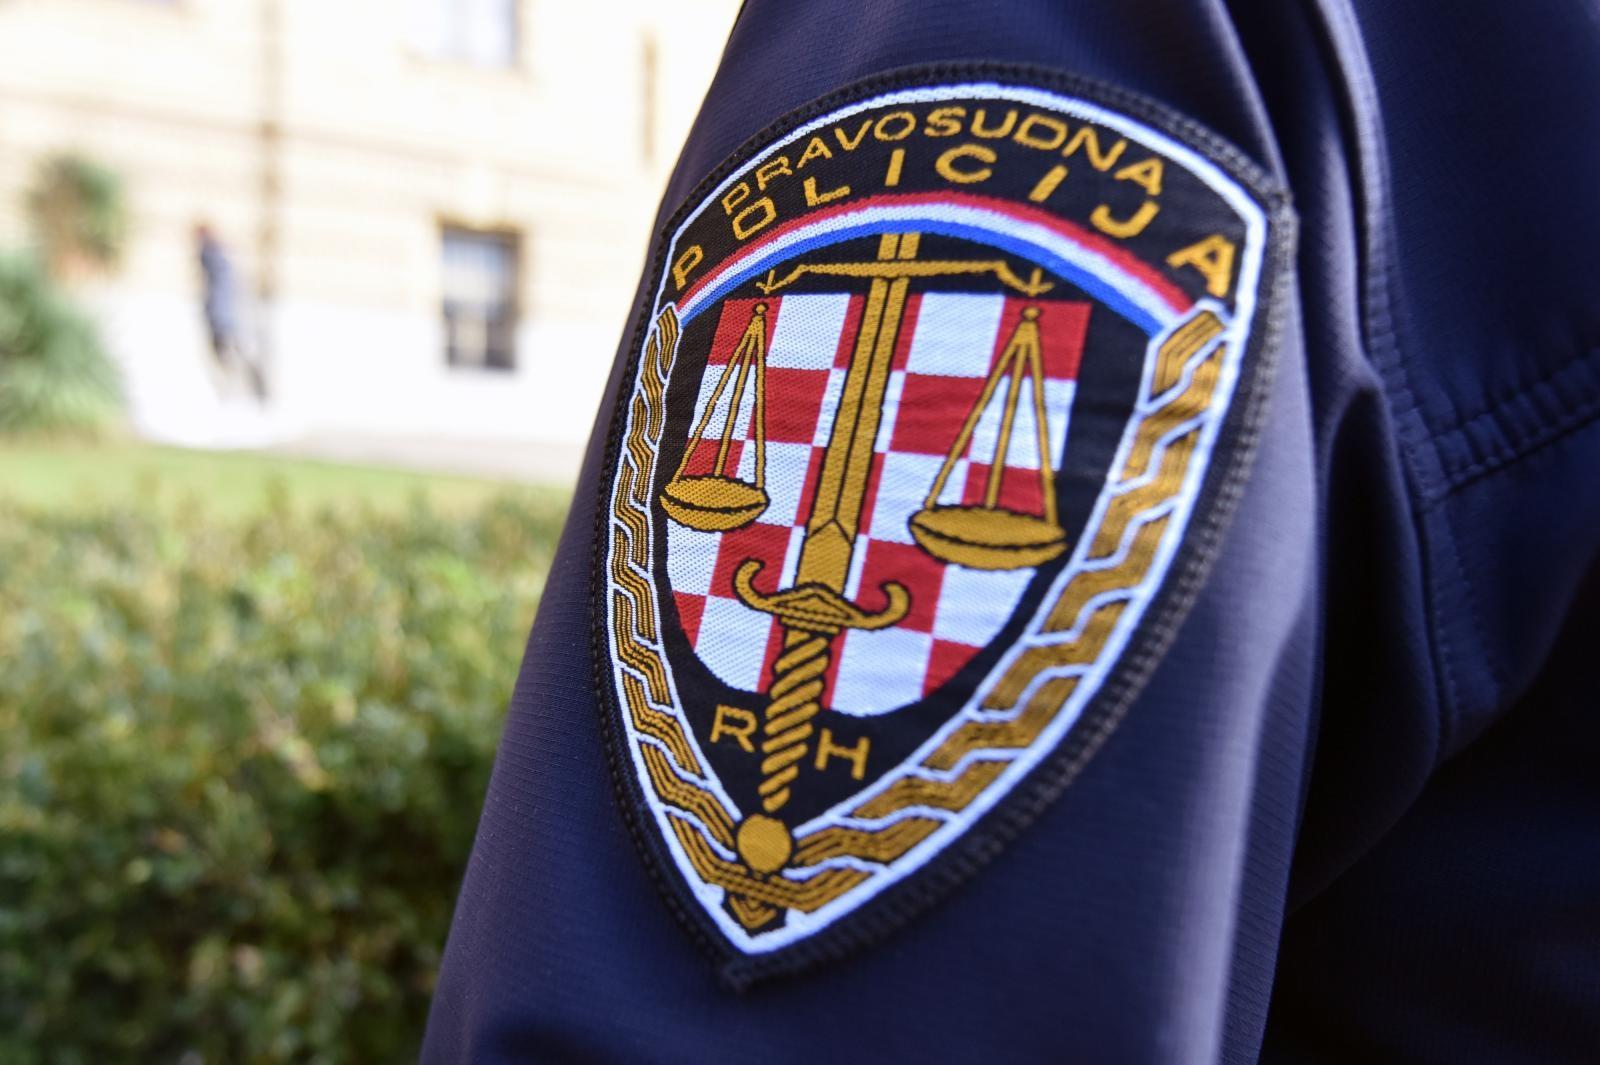 Čestitamo Dan pravosudne policije